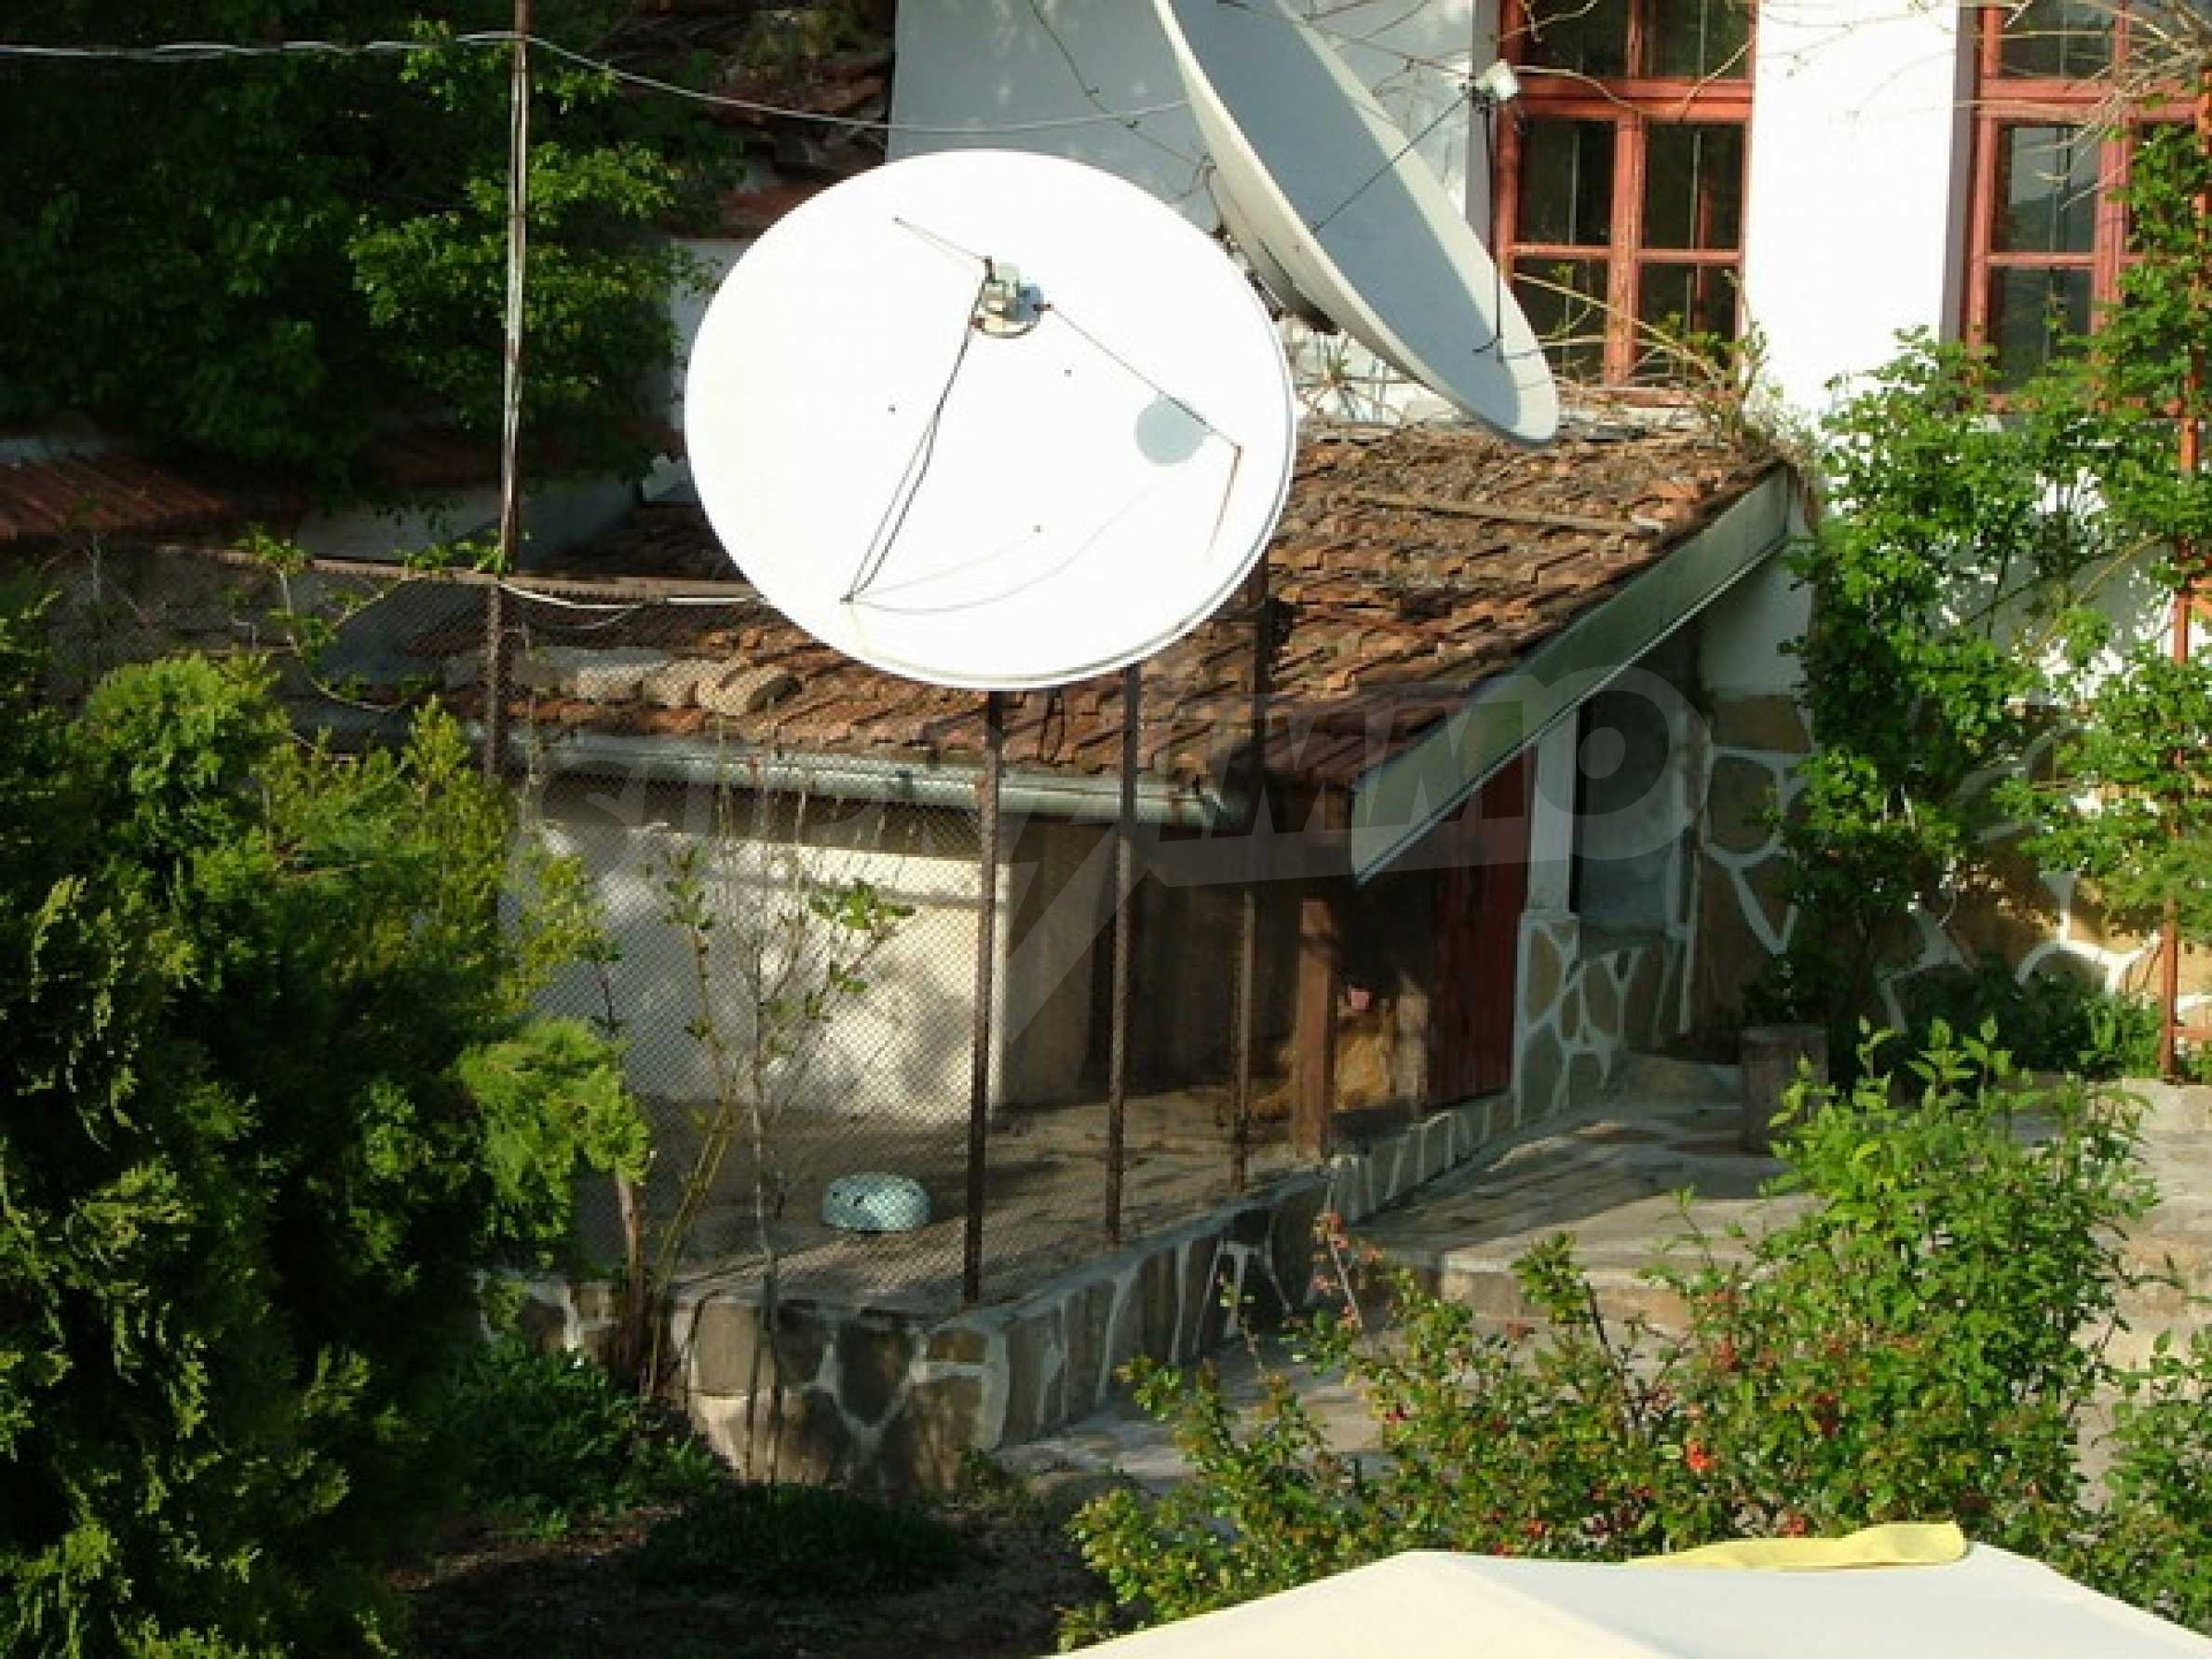 Stilvoll renovierte Villa 12 km entfernt. von Veliko Tarnovo 34